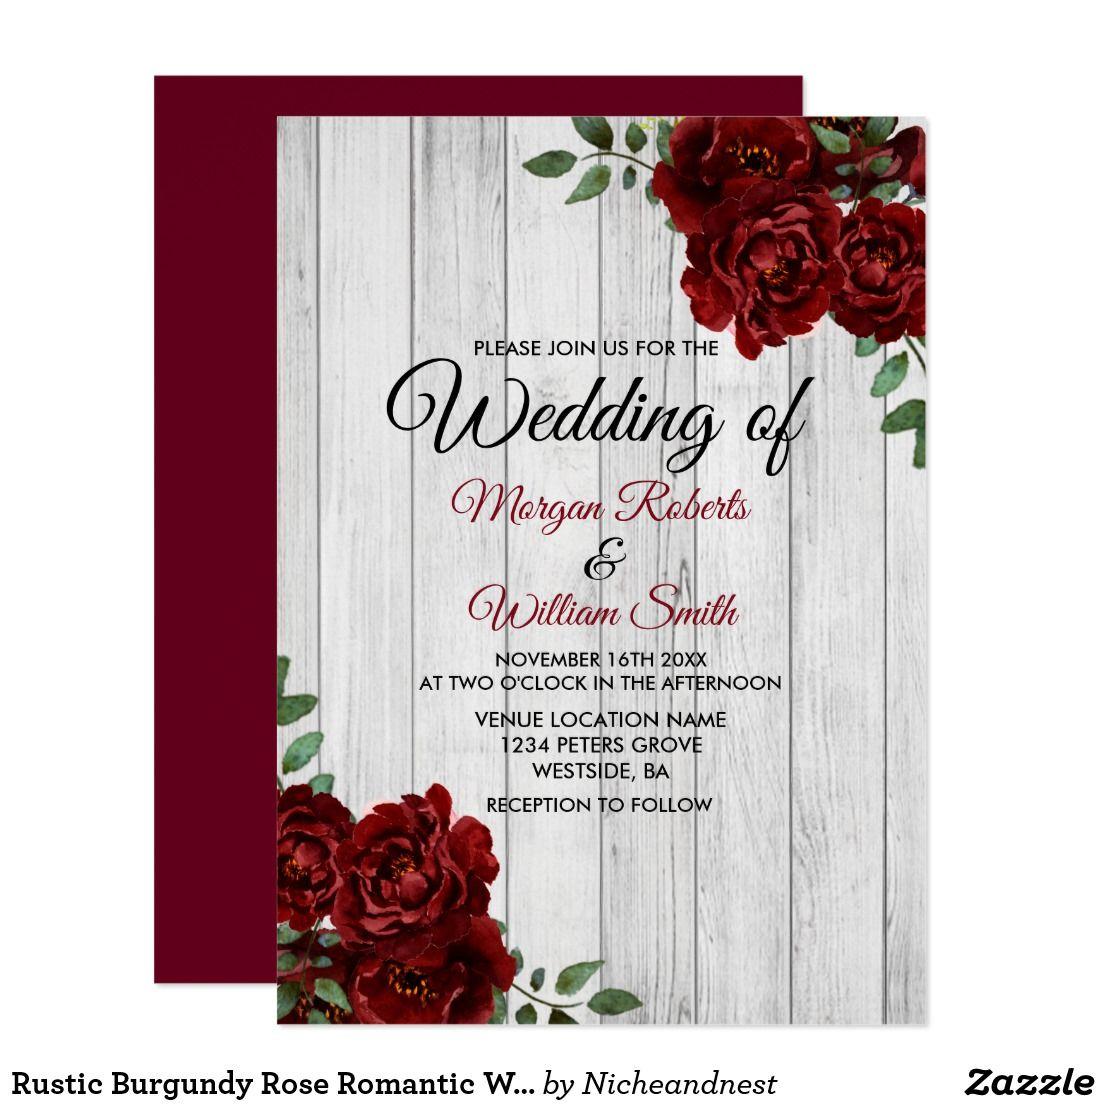 Rustic Burgundy Rose Romantic Wedding Invitation | Celebrations ...